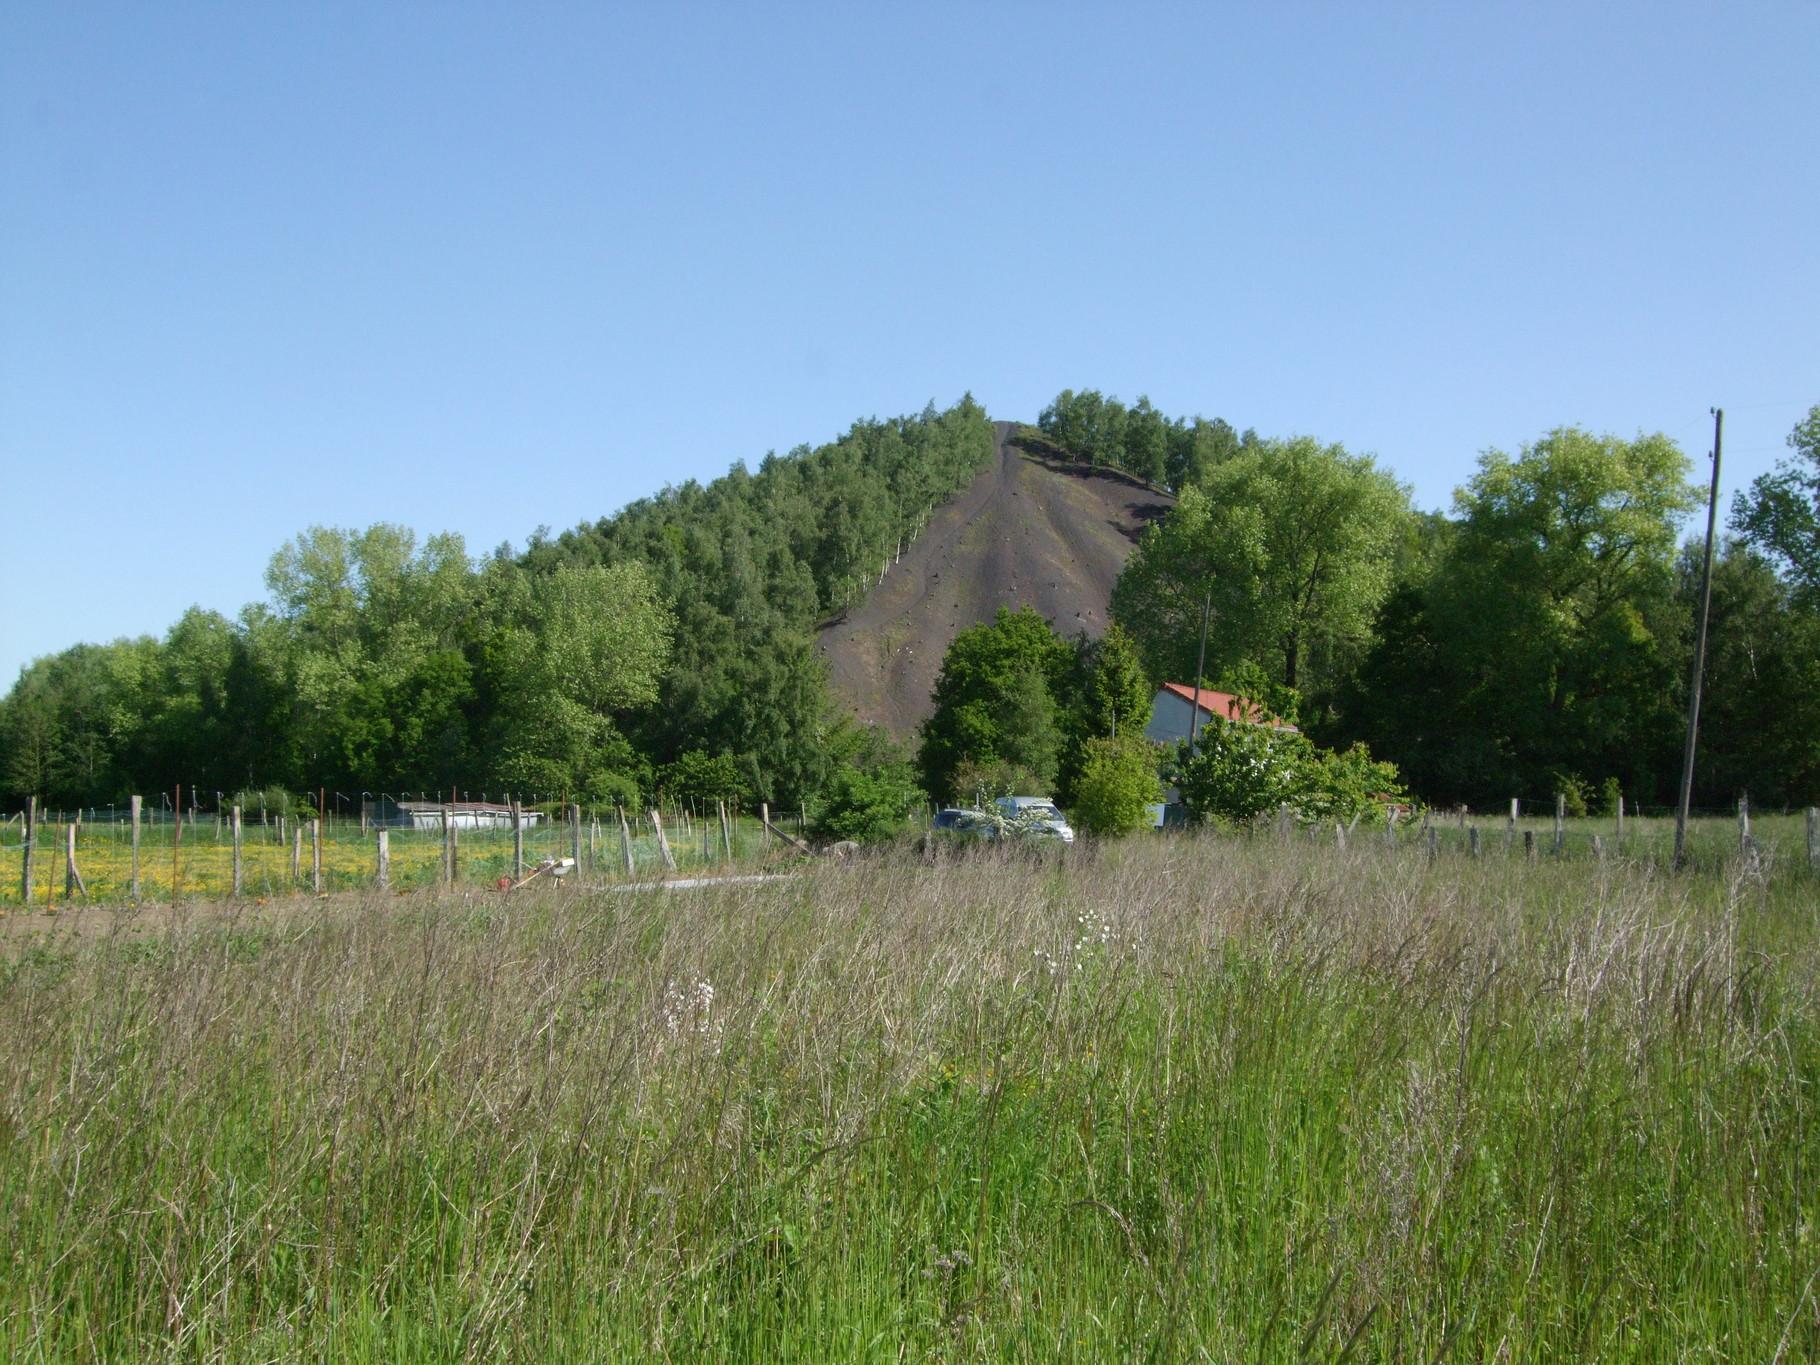 Patrimoine r gional le bassin minier nord pas de calais for Agence paysage nord